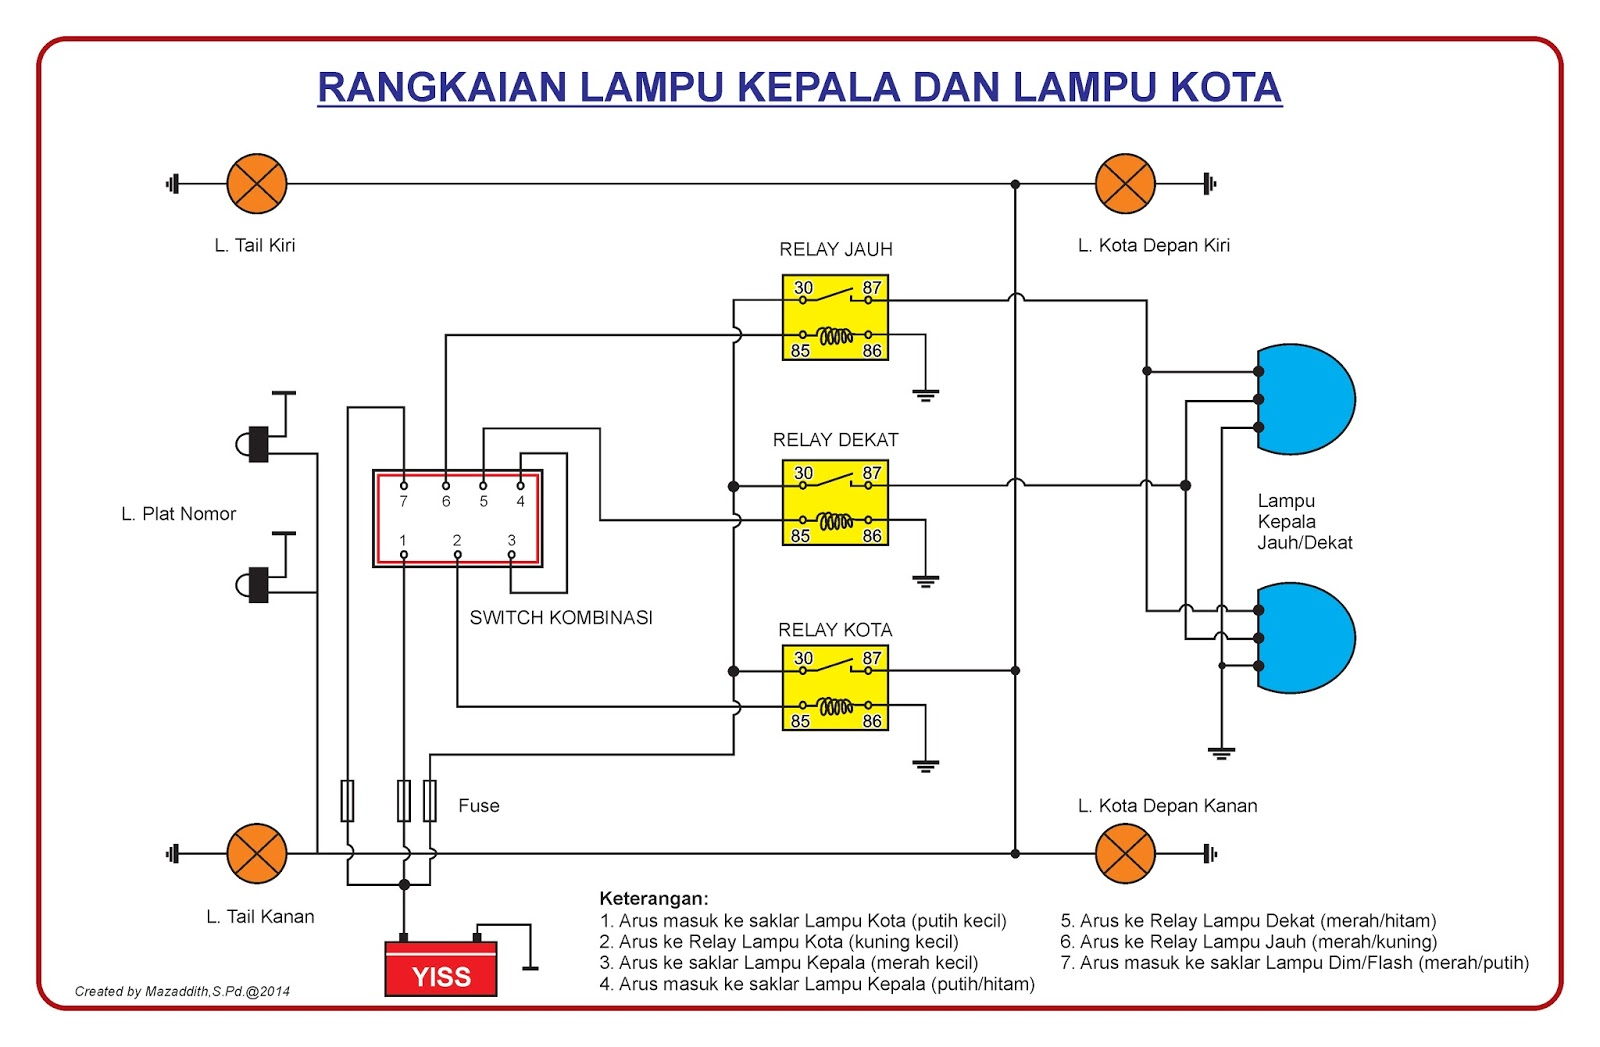 wiring diagram lampu kepala example electrical wiring diagram u2022 rh olkha co